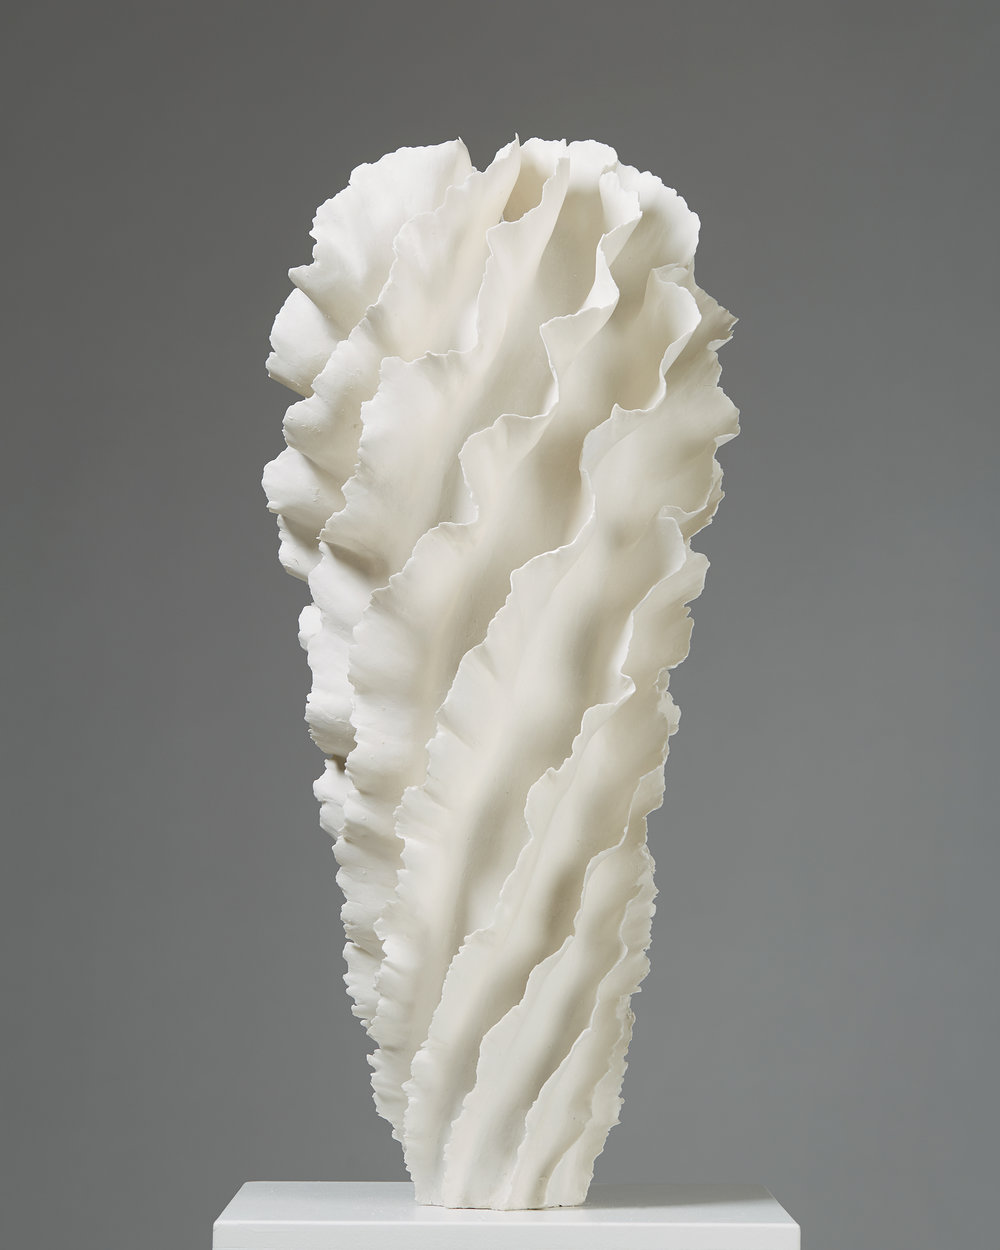 Sandra Davolio   Vase Denmark, 2018 Porcelain. 67,5 x 28 cm